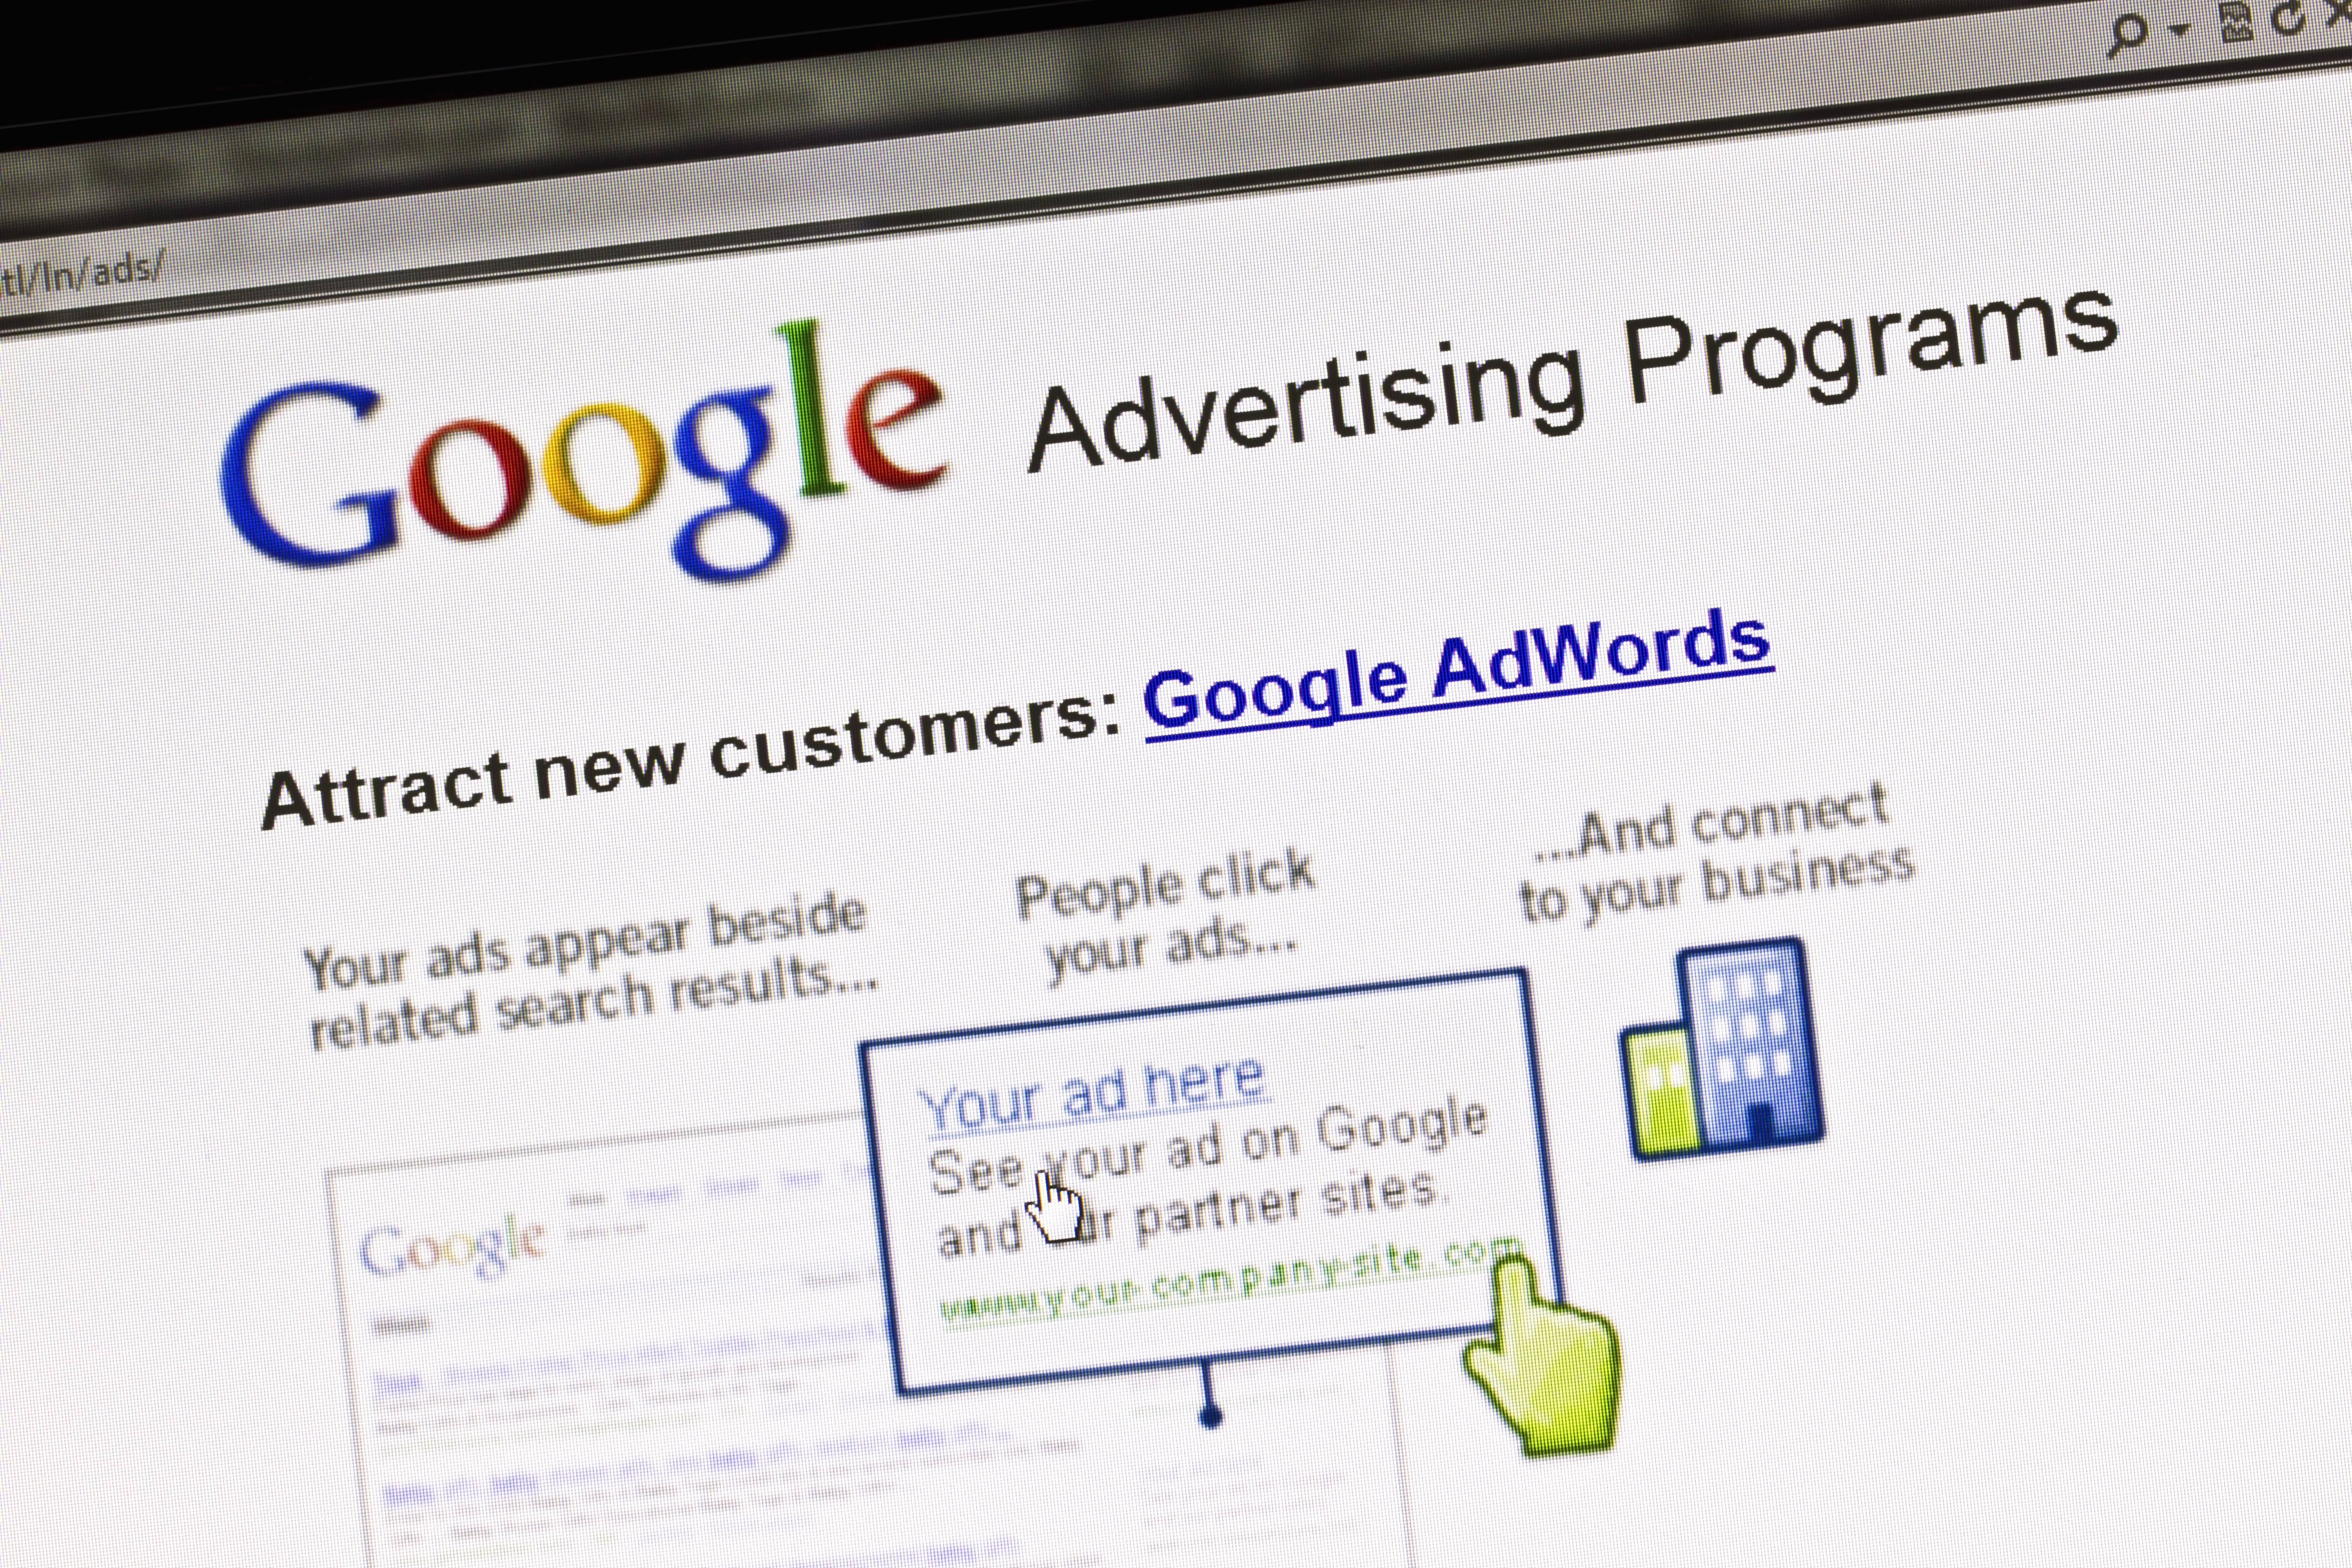 Google Advertising Program